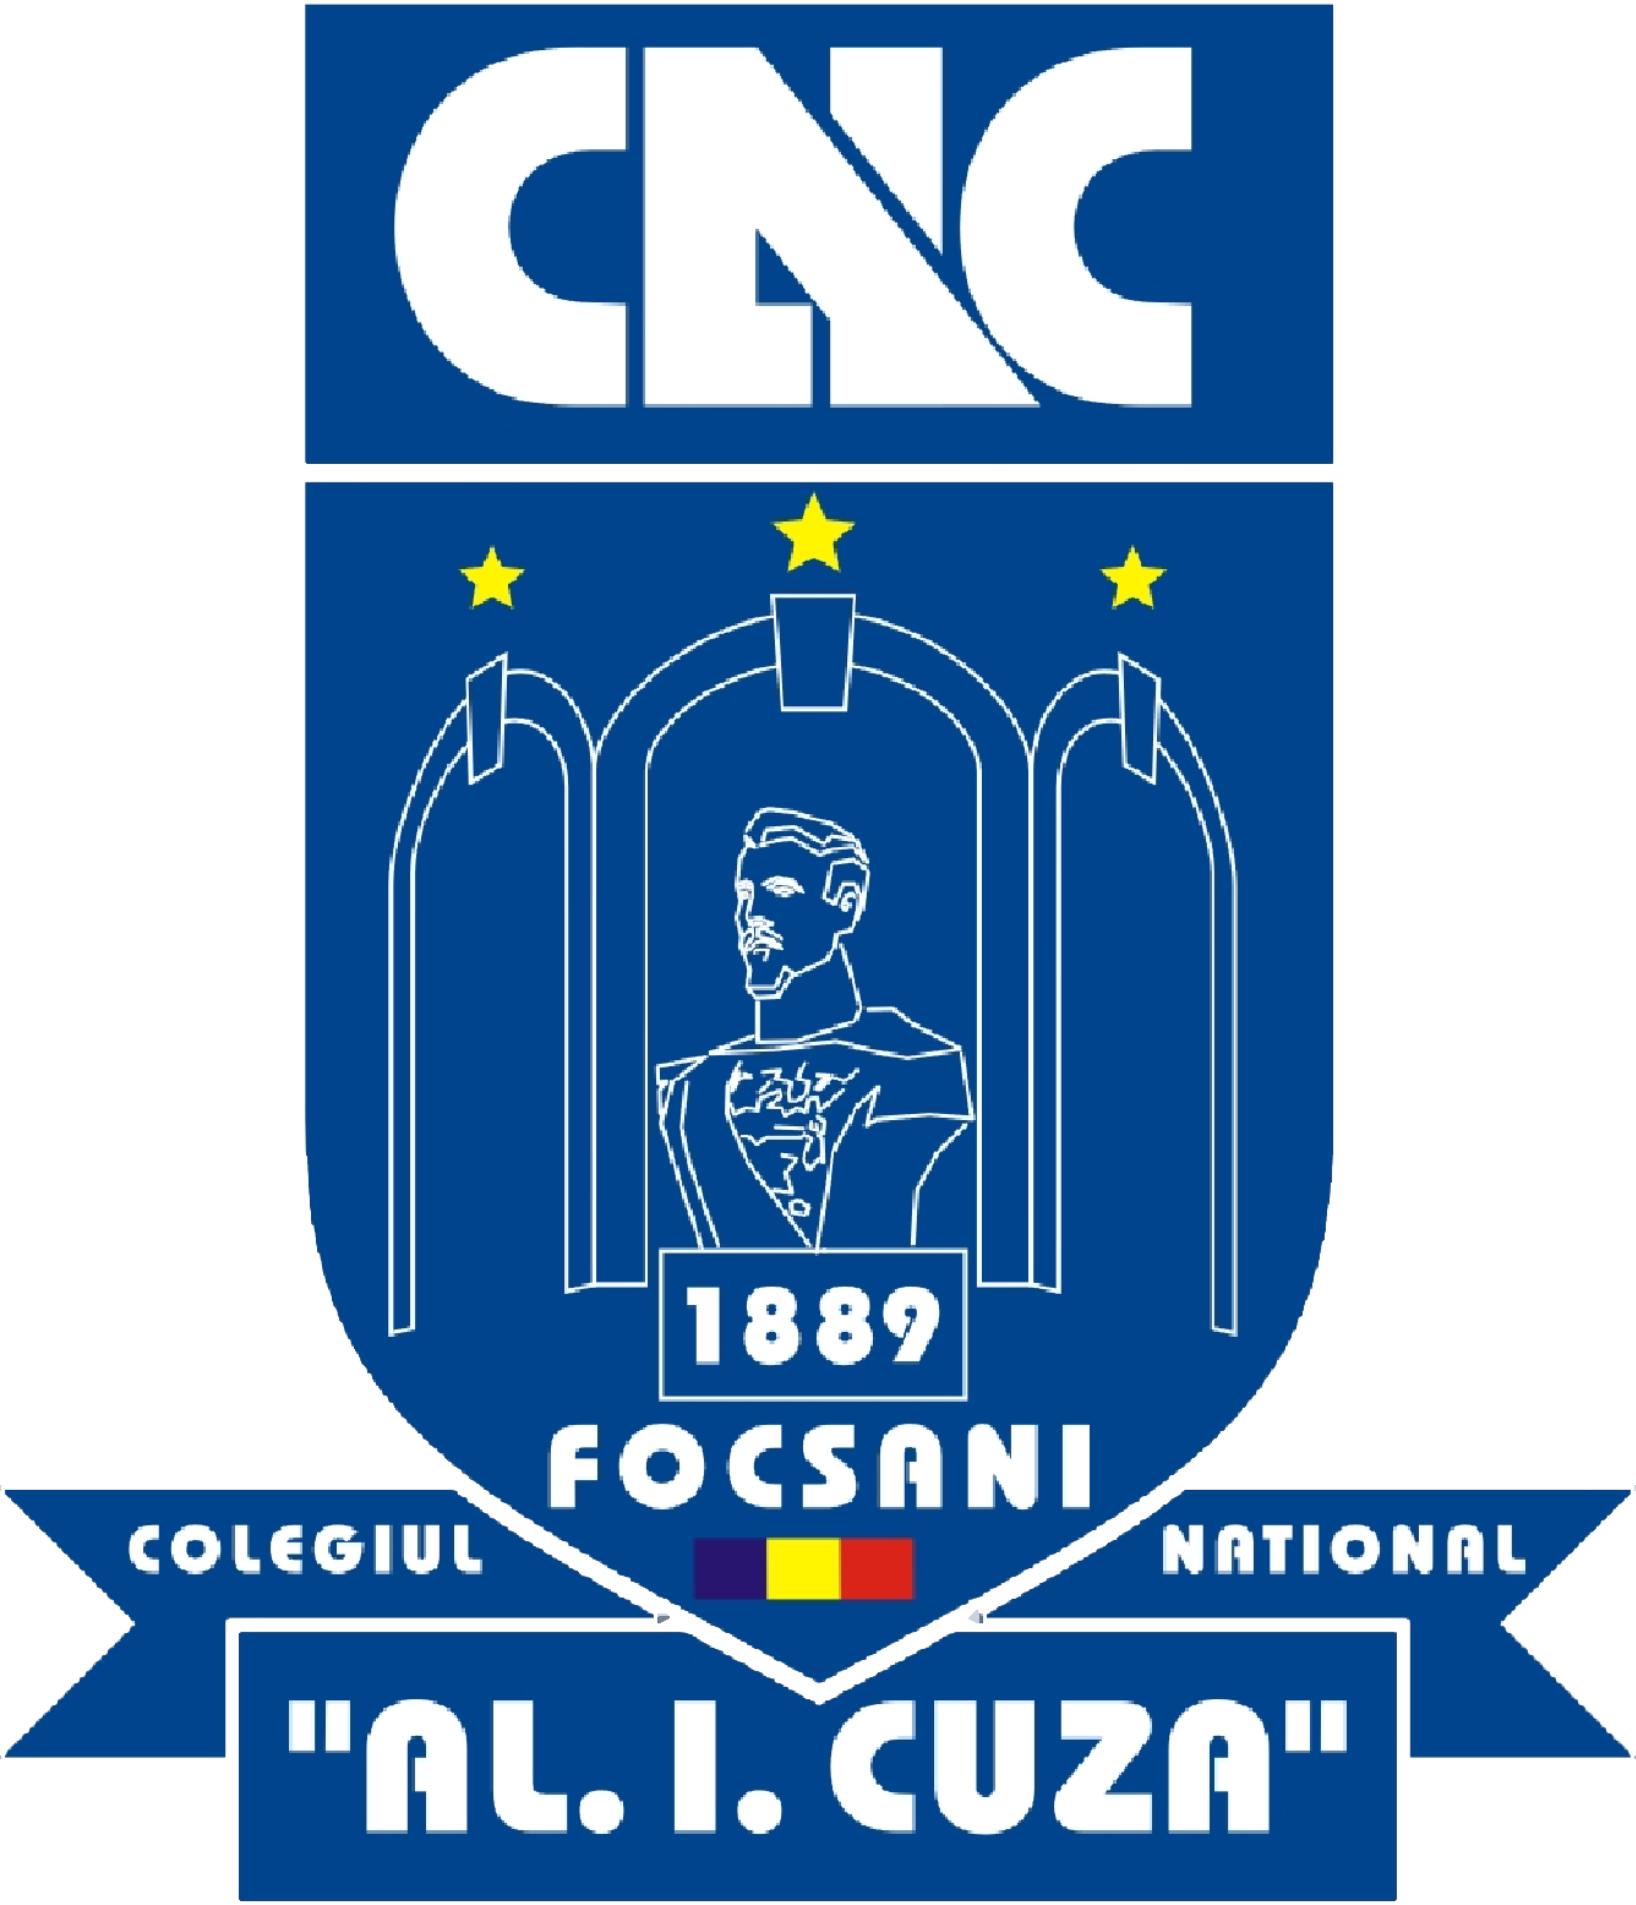 "Colegiul National \""Alexandru Ioan Cuza\"" Focsani"